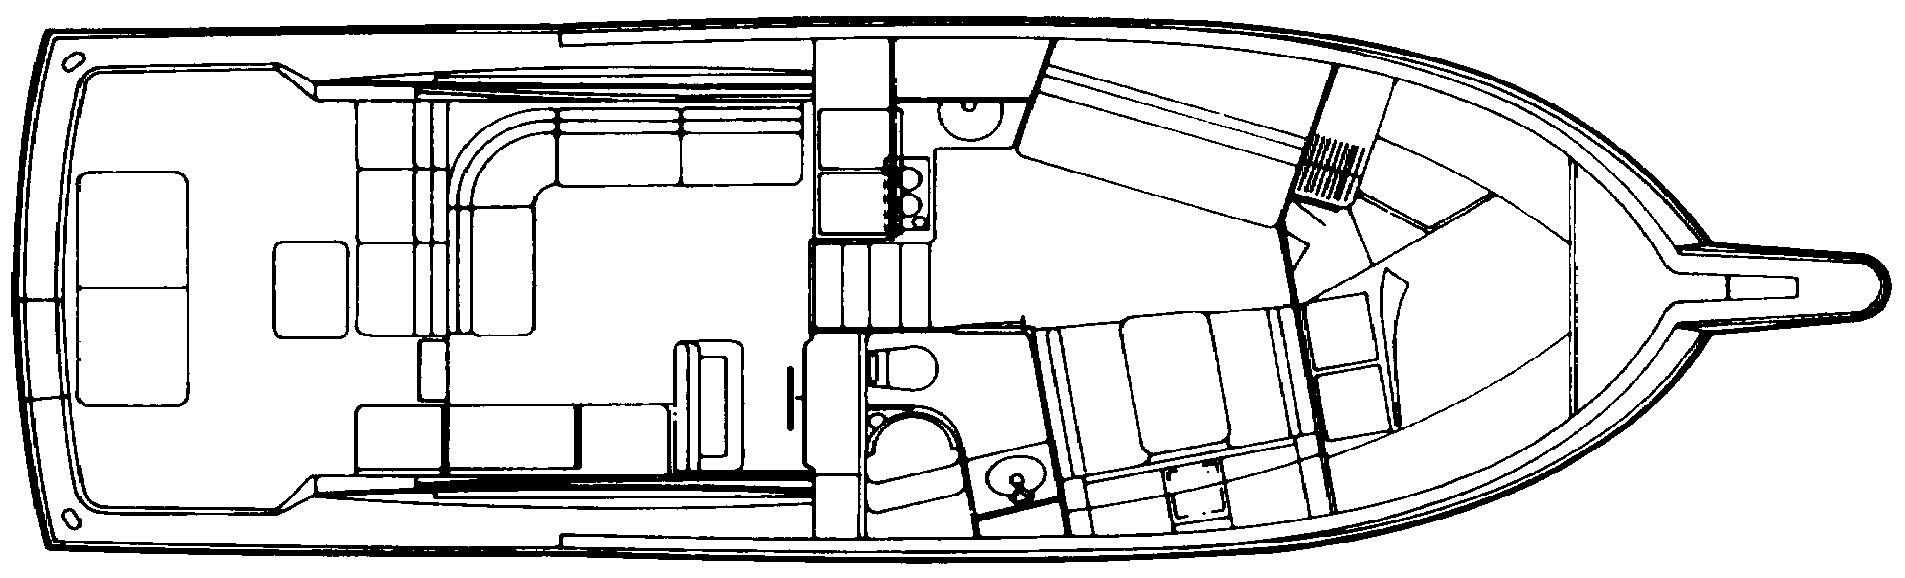 39 Sport Express Floor Plan 2